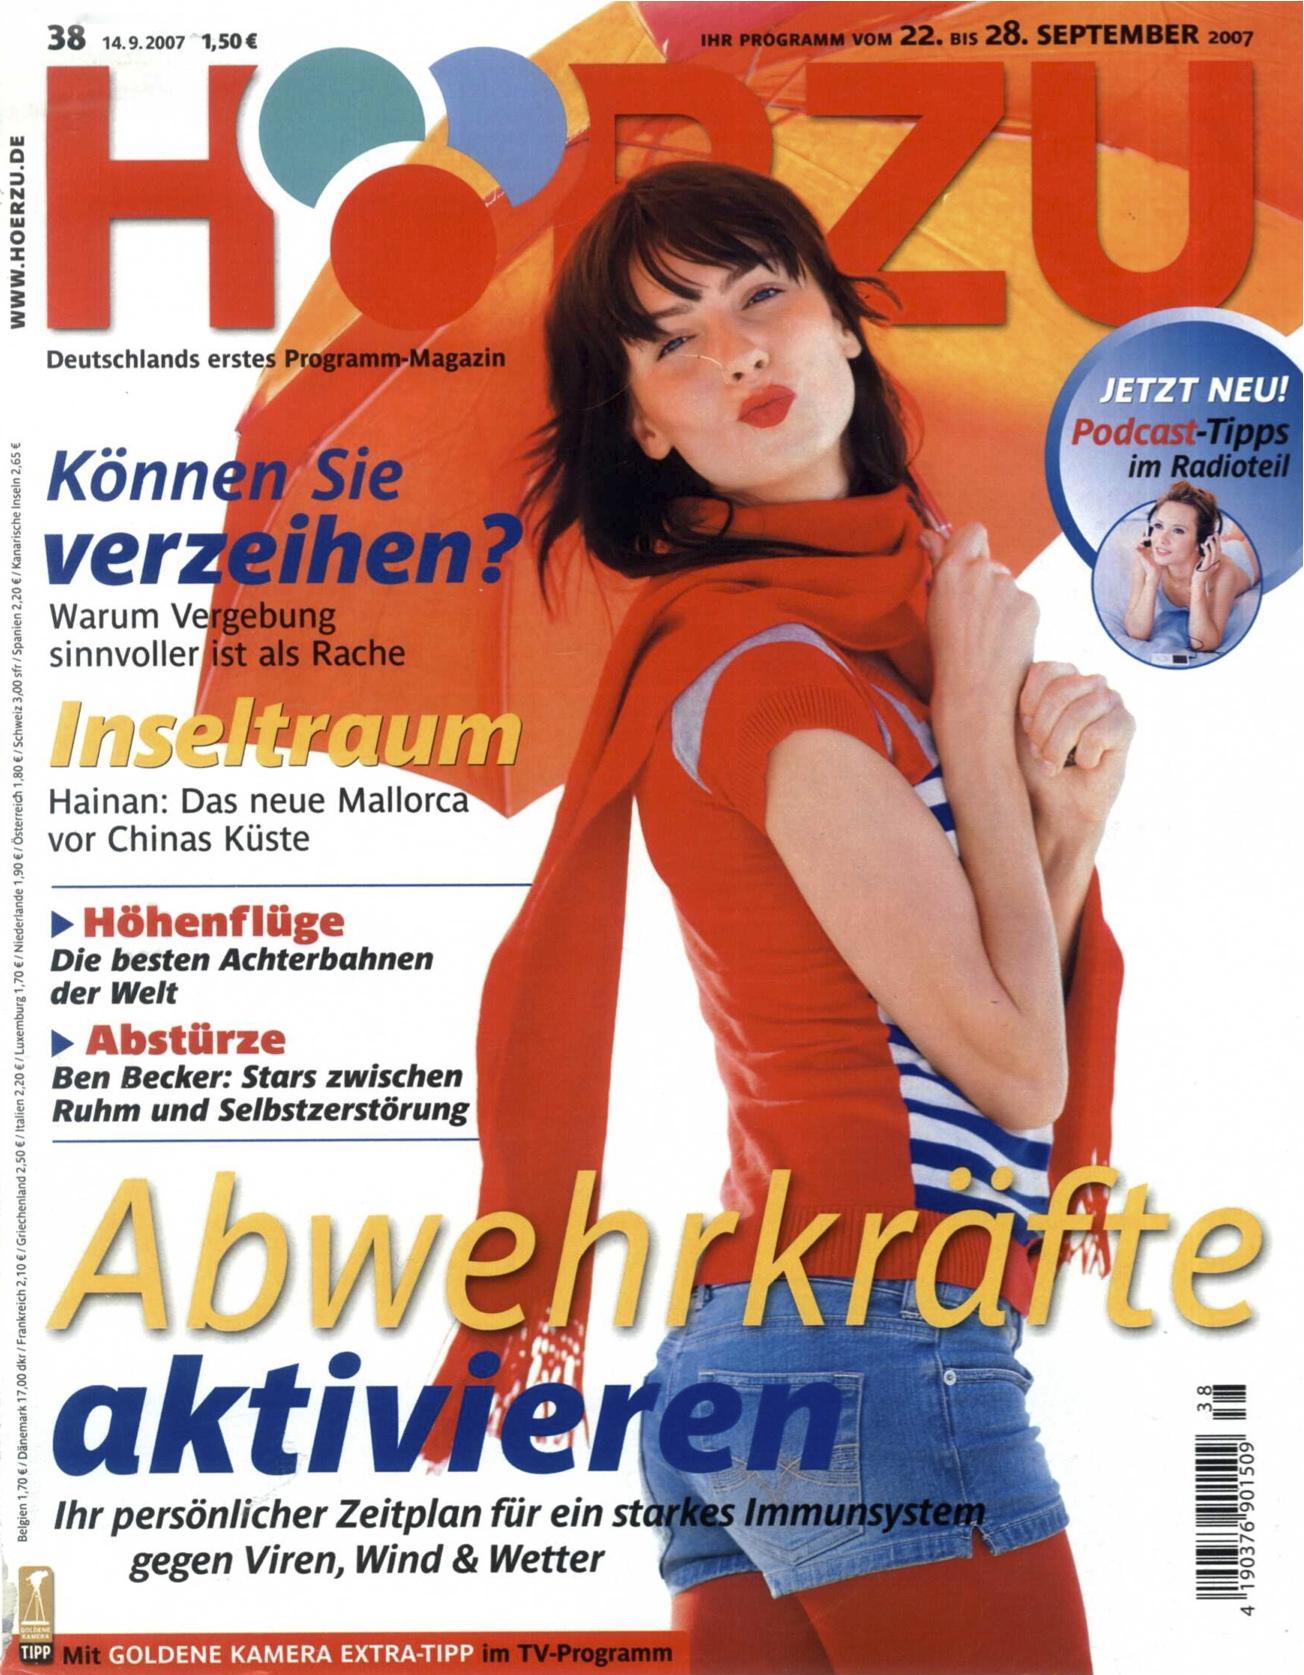 HZ_14.9.2007_Covers.jpg